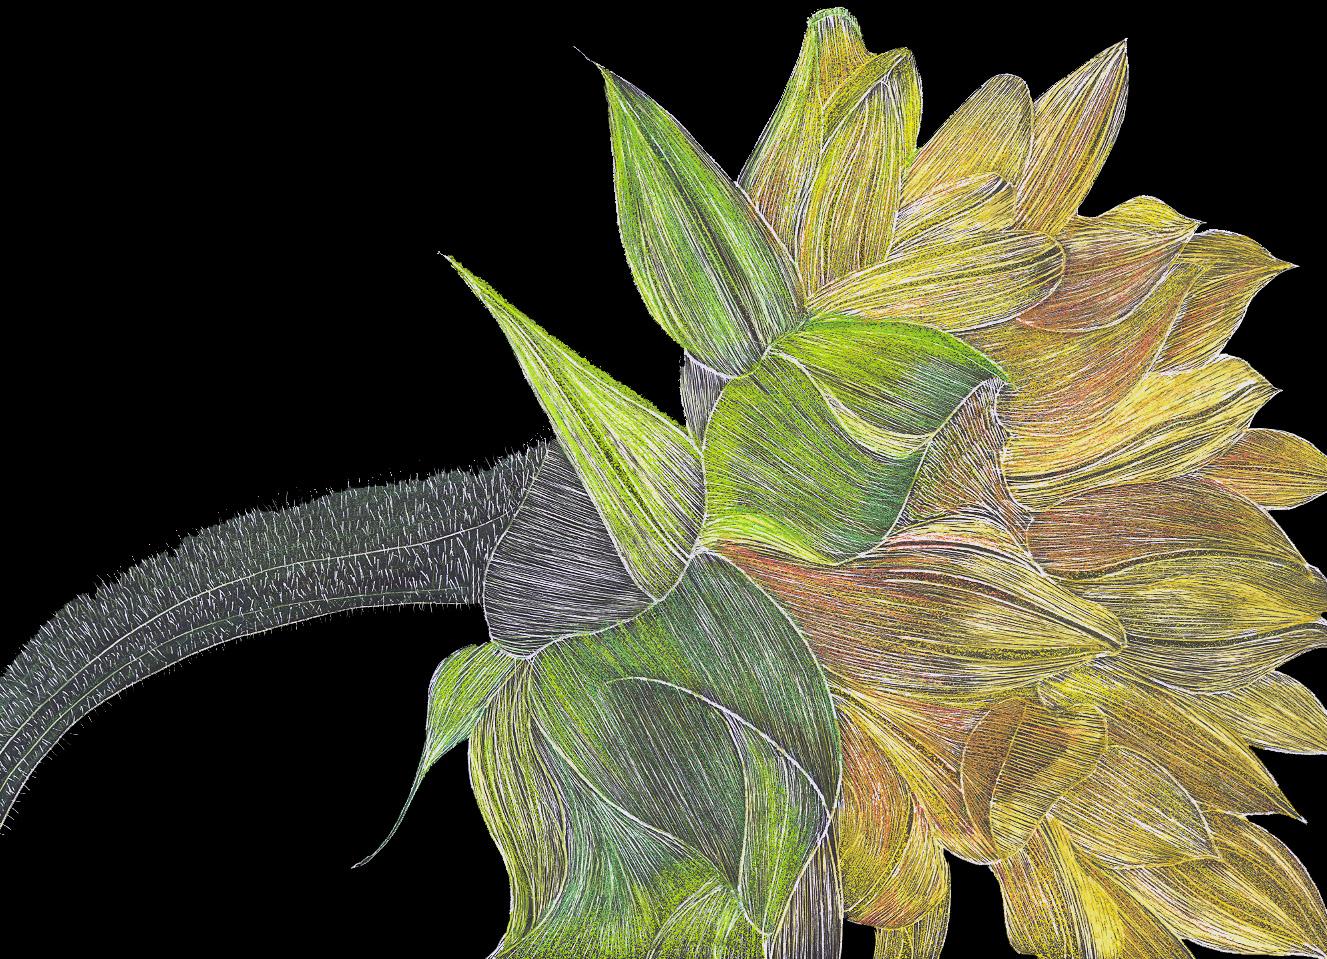 #29 Sunflower 18x16 Scratchbord & Prismacolor Pencils $900.jpg